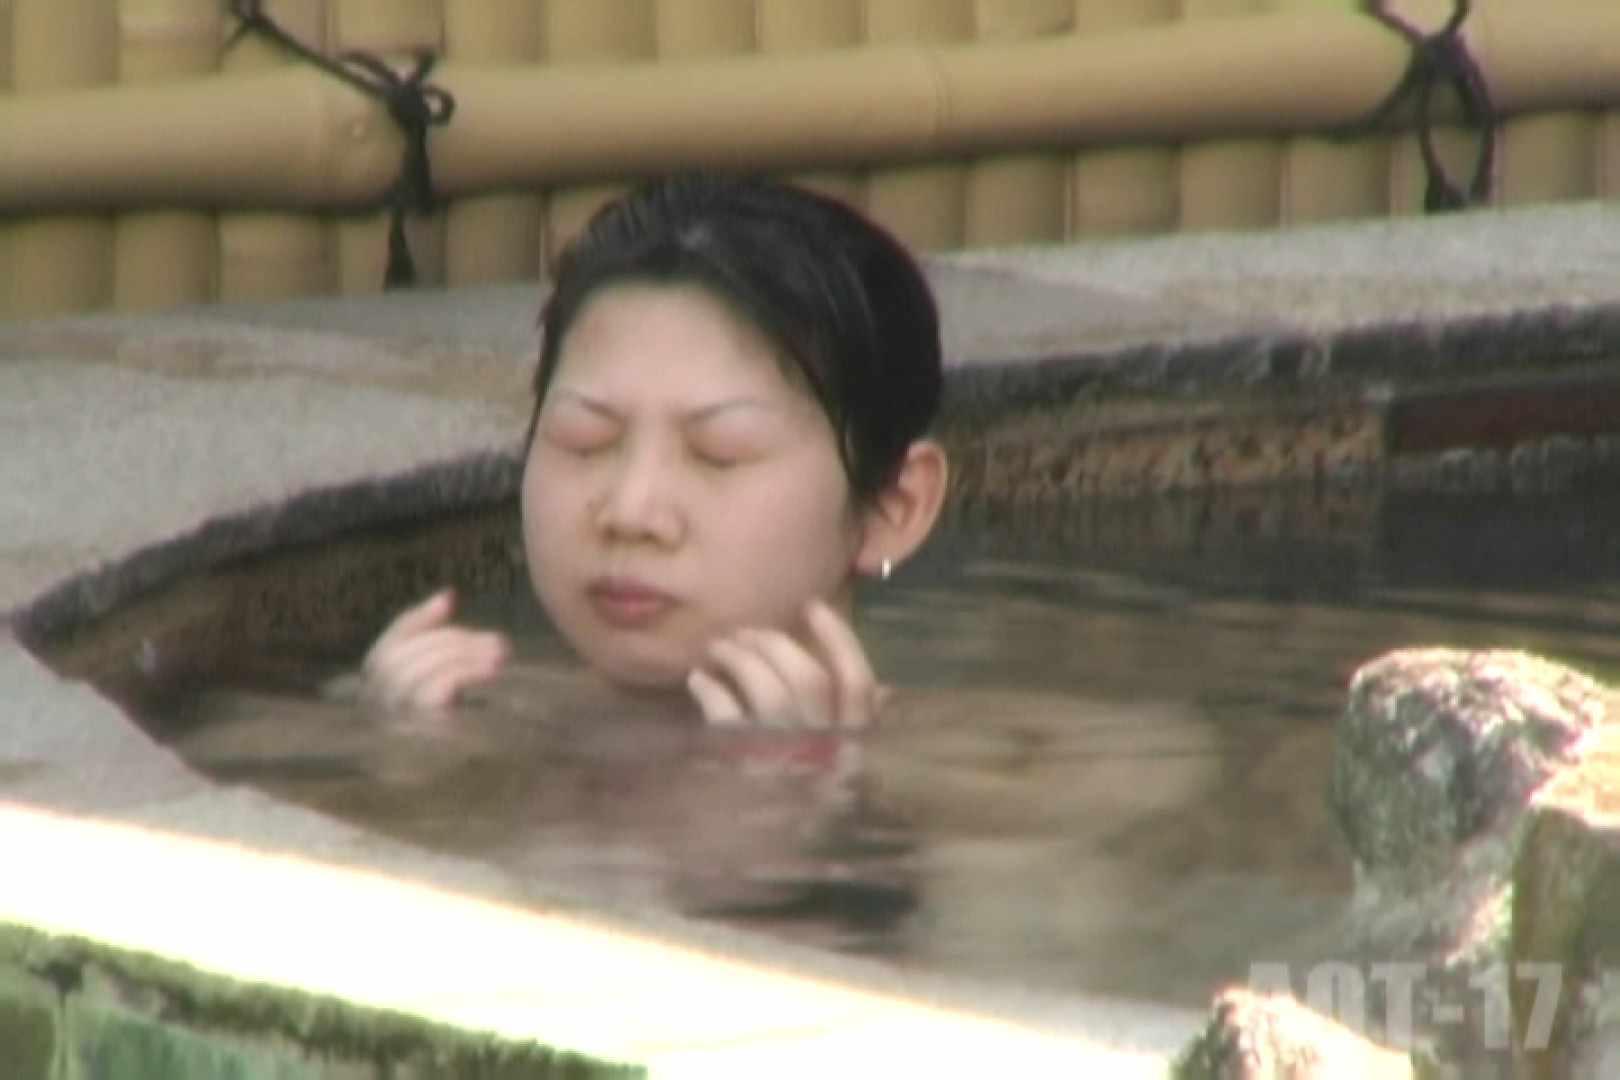 Aquaな露天風呂Vol.850 露天風呂突入 | 盗撮師作品  73pic 7